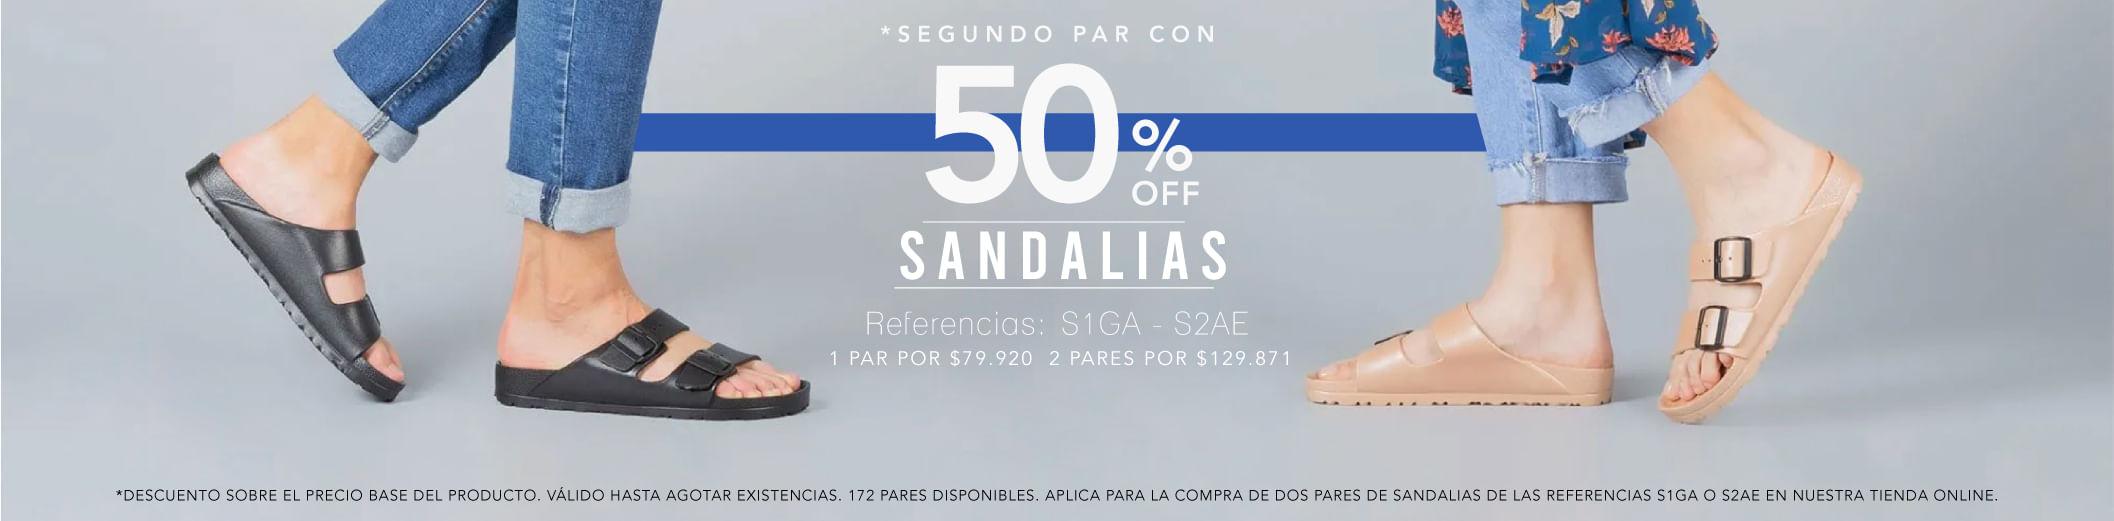 Promoción Sandalias Freeport